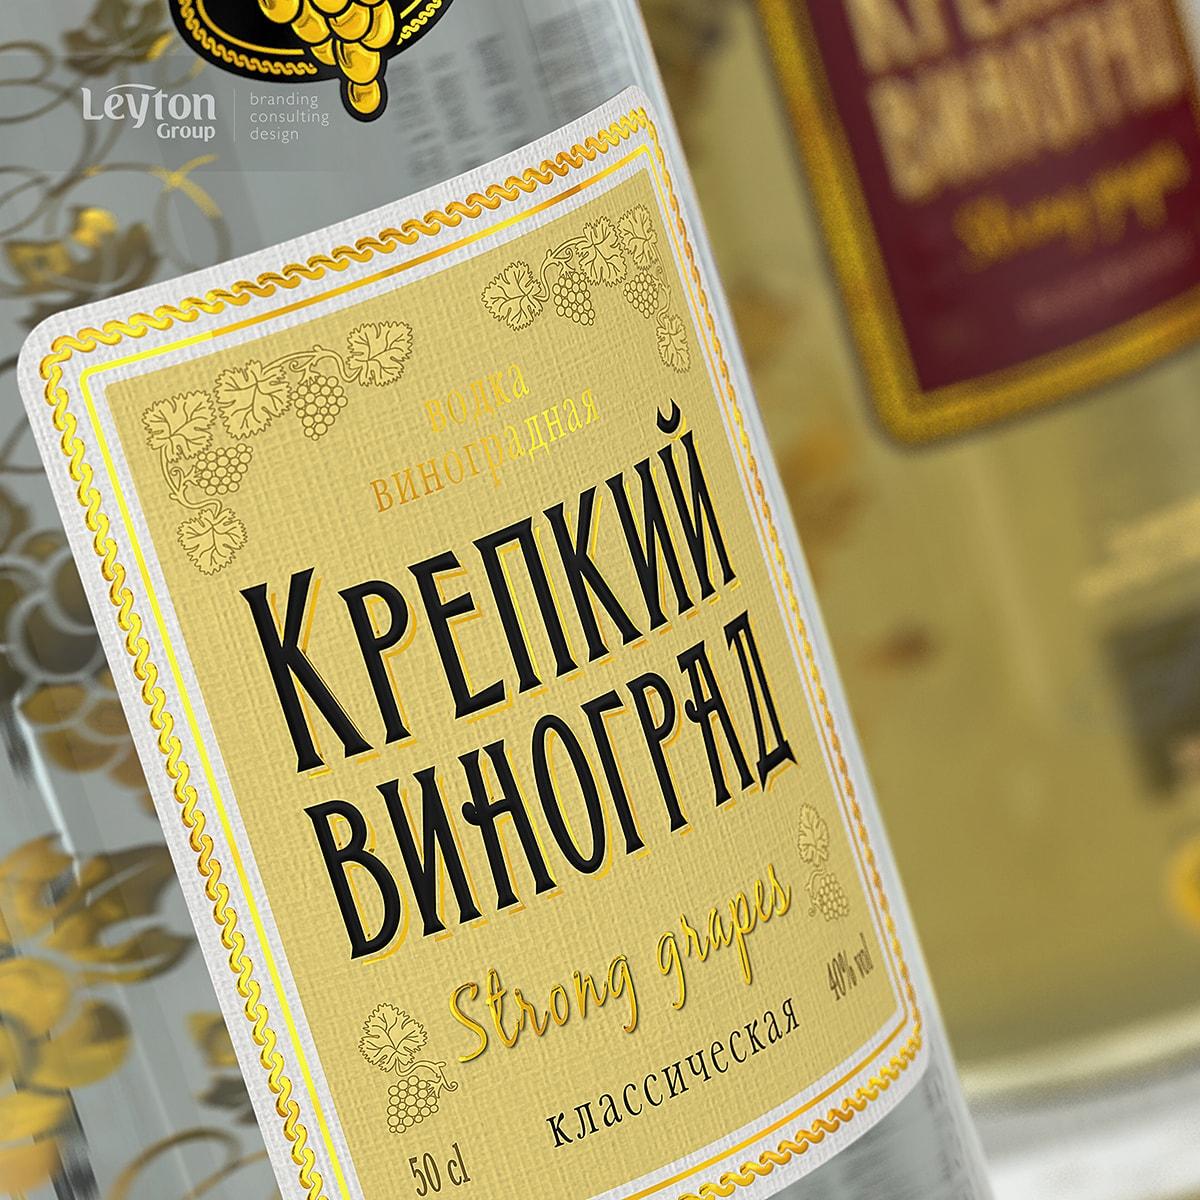 Крепкий Виноград – водка – дизайн – Leyton Group